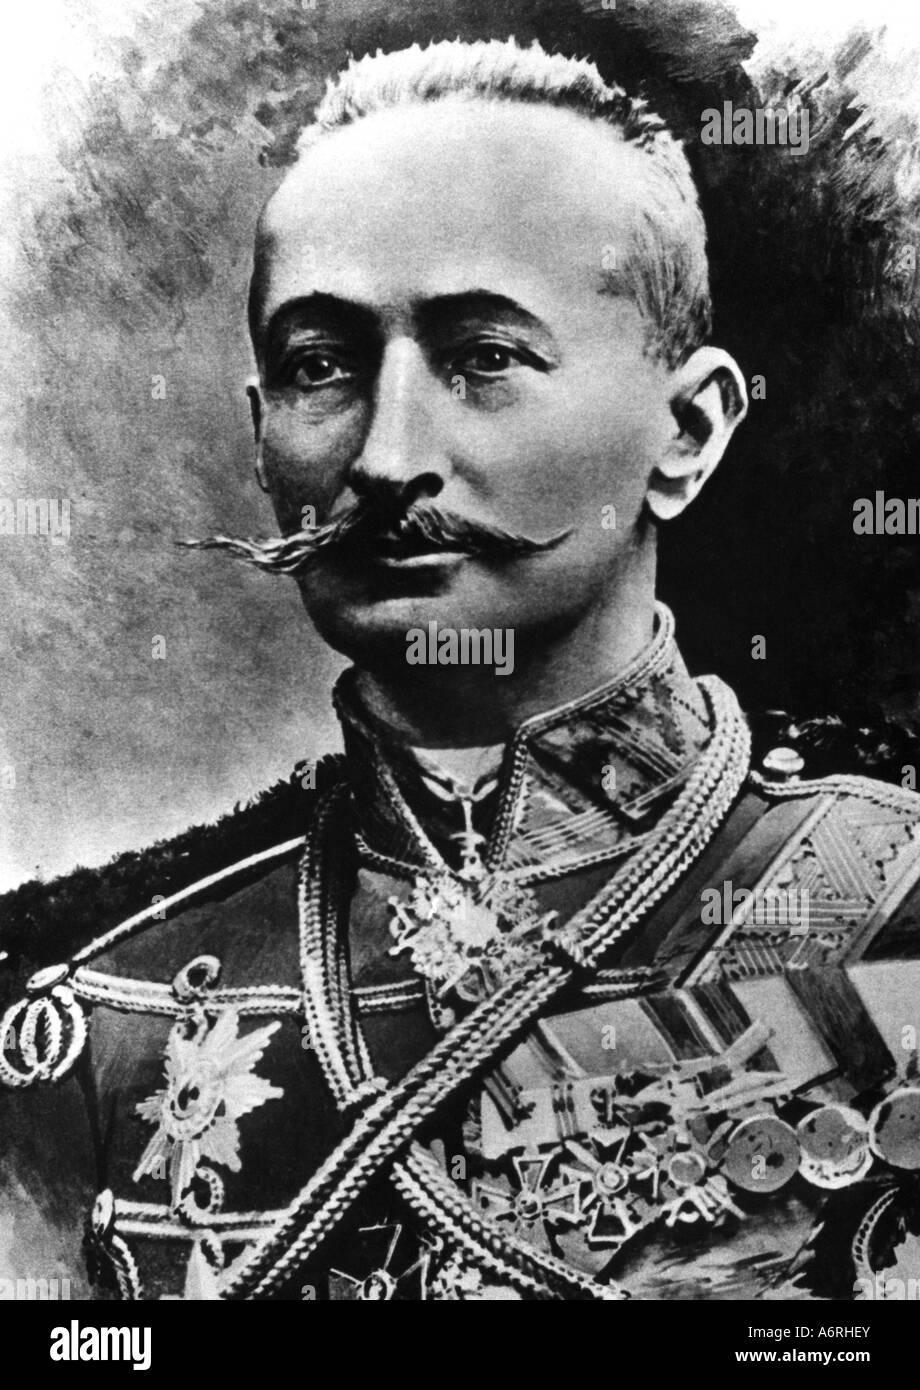 Brussilow, Alexej Alexejewitsch, 19.8.1853 - 17.3.1926, Russian General, portrait, circa 1914, Alexei, Aleksei, - Stock Image